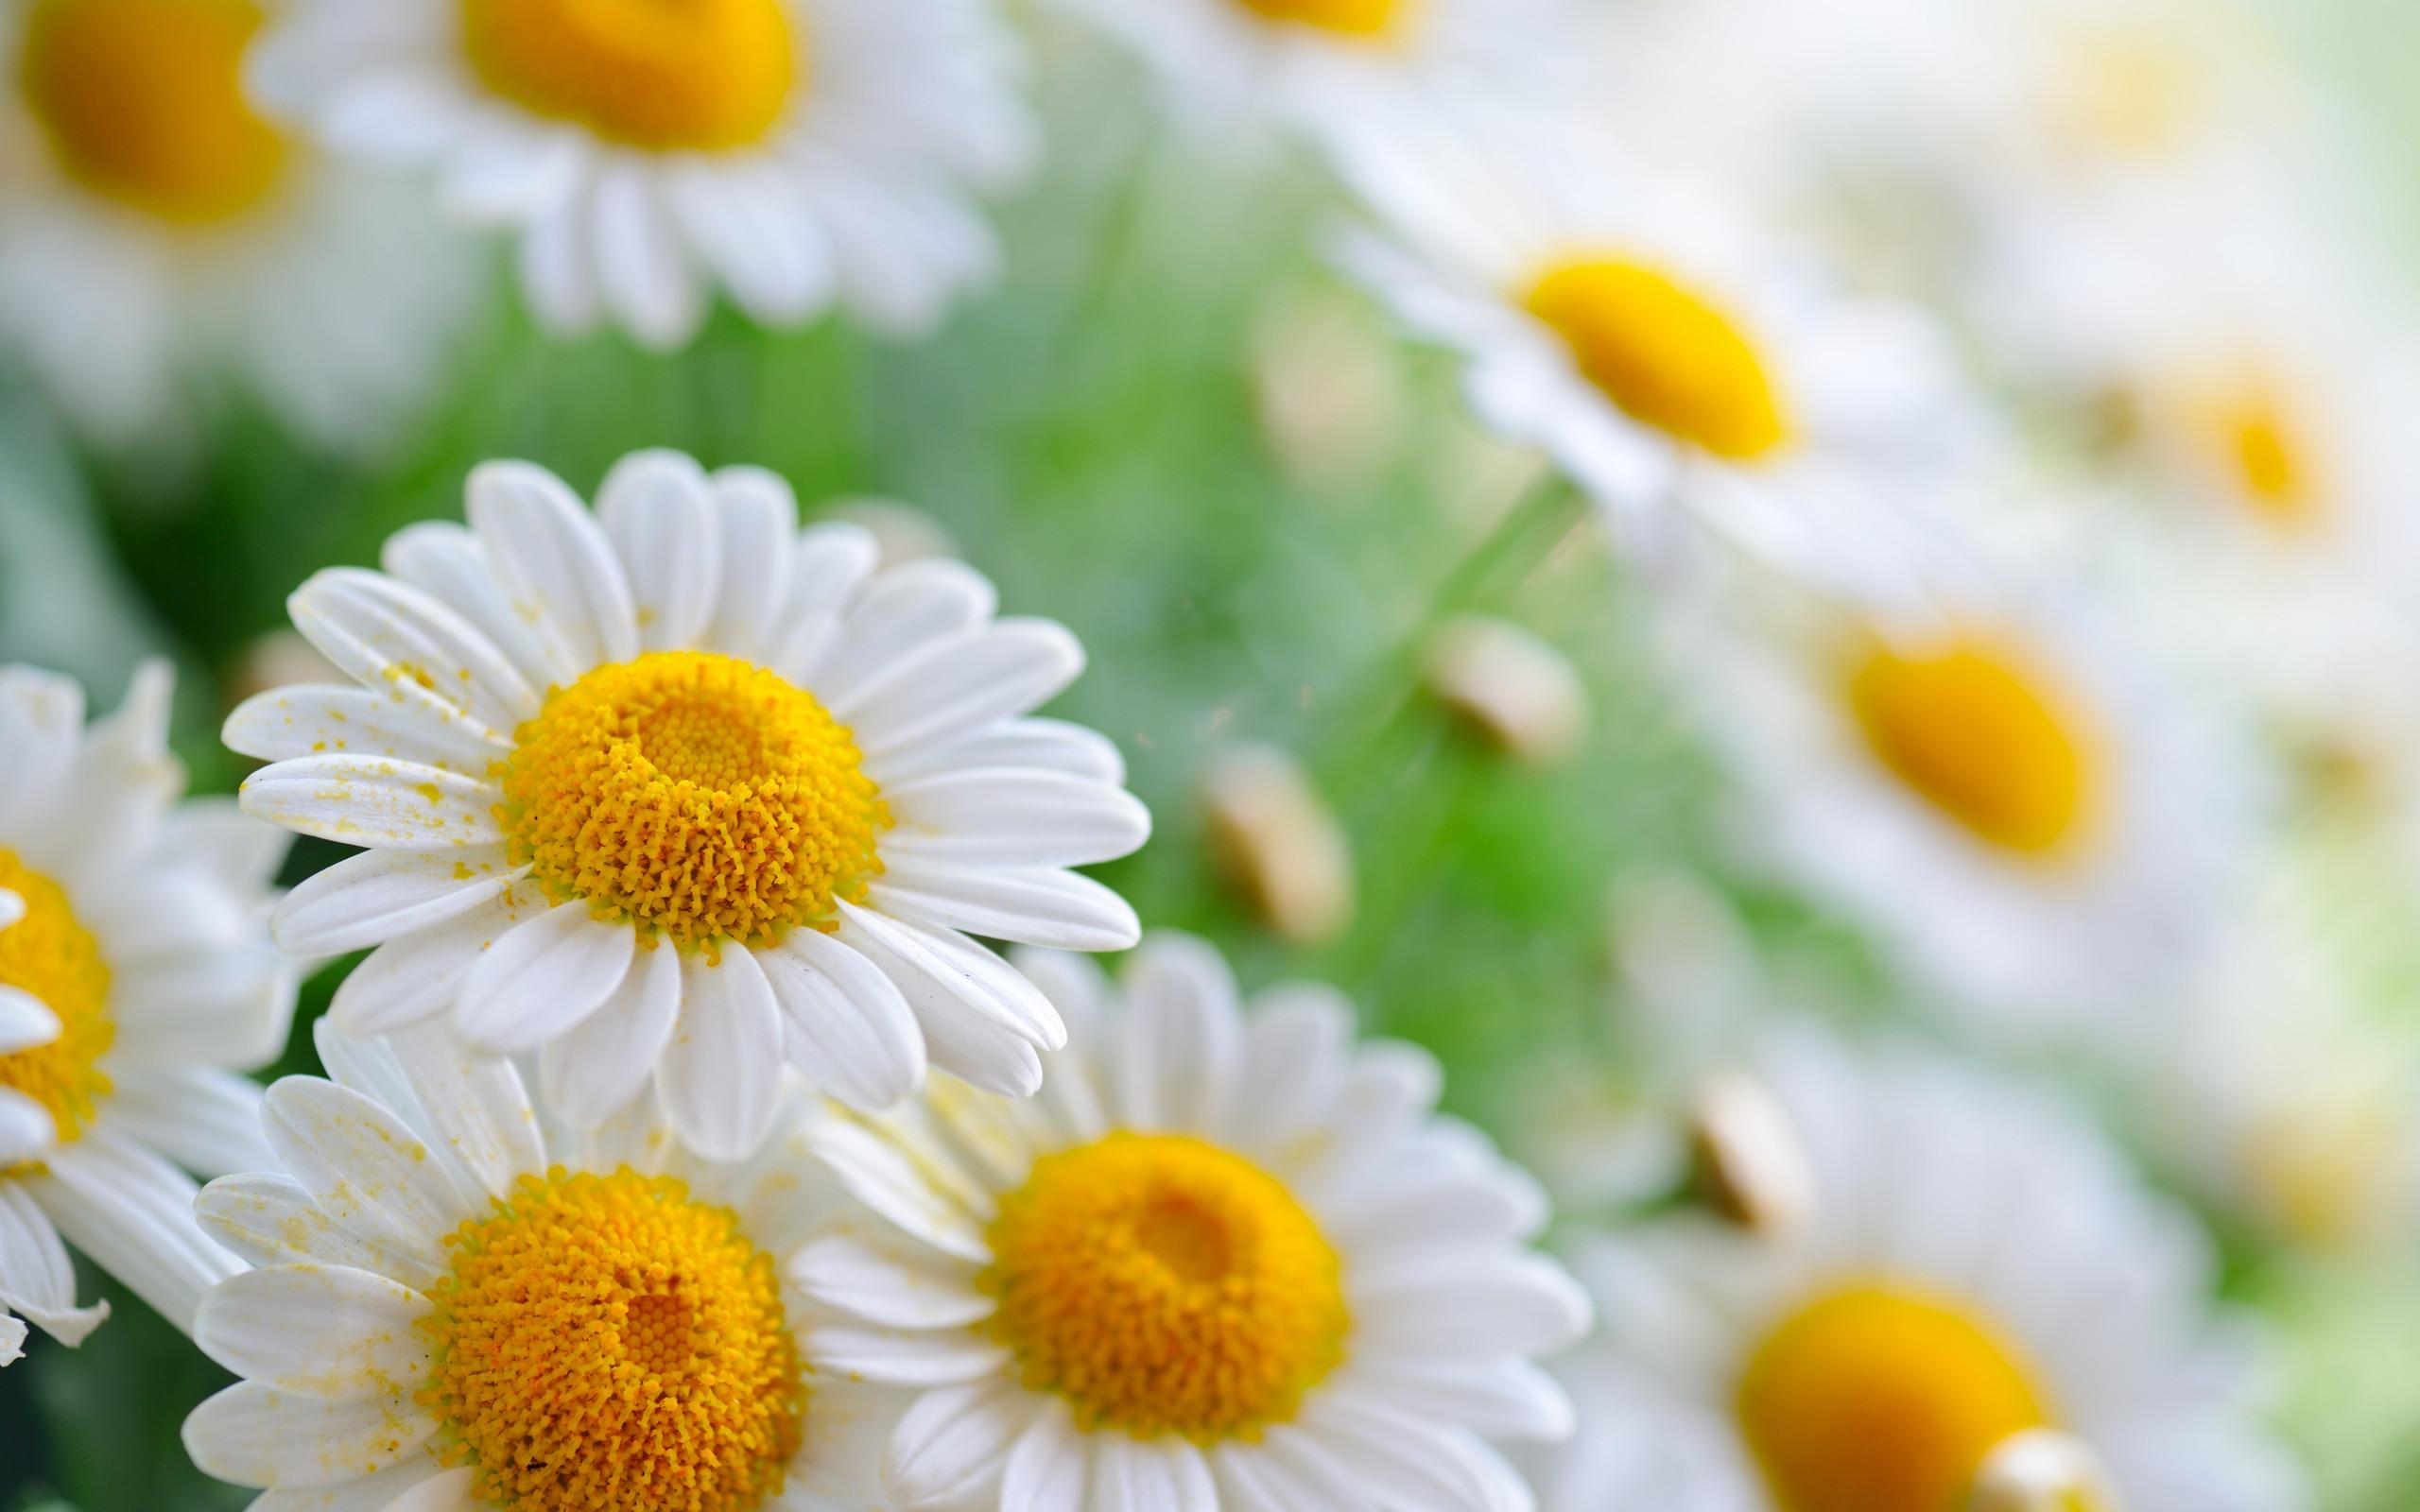 Daisy flower wallpaper 57 images 2560x1600 daisy flower cute wallpaper wallpaper izmirmasajfo